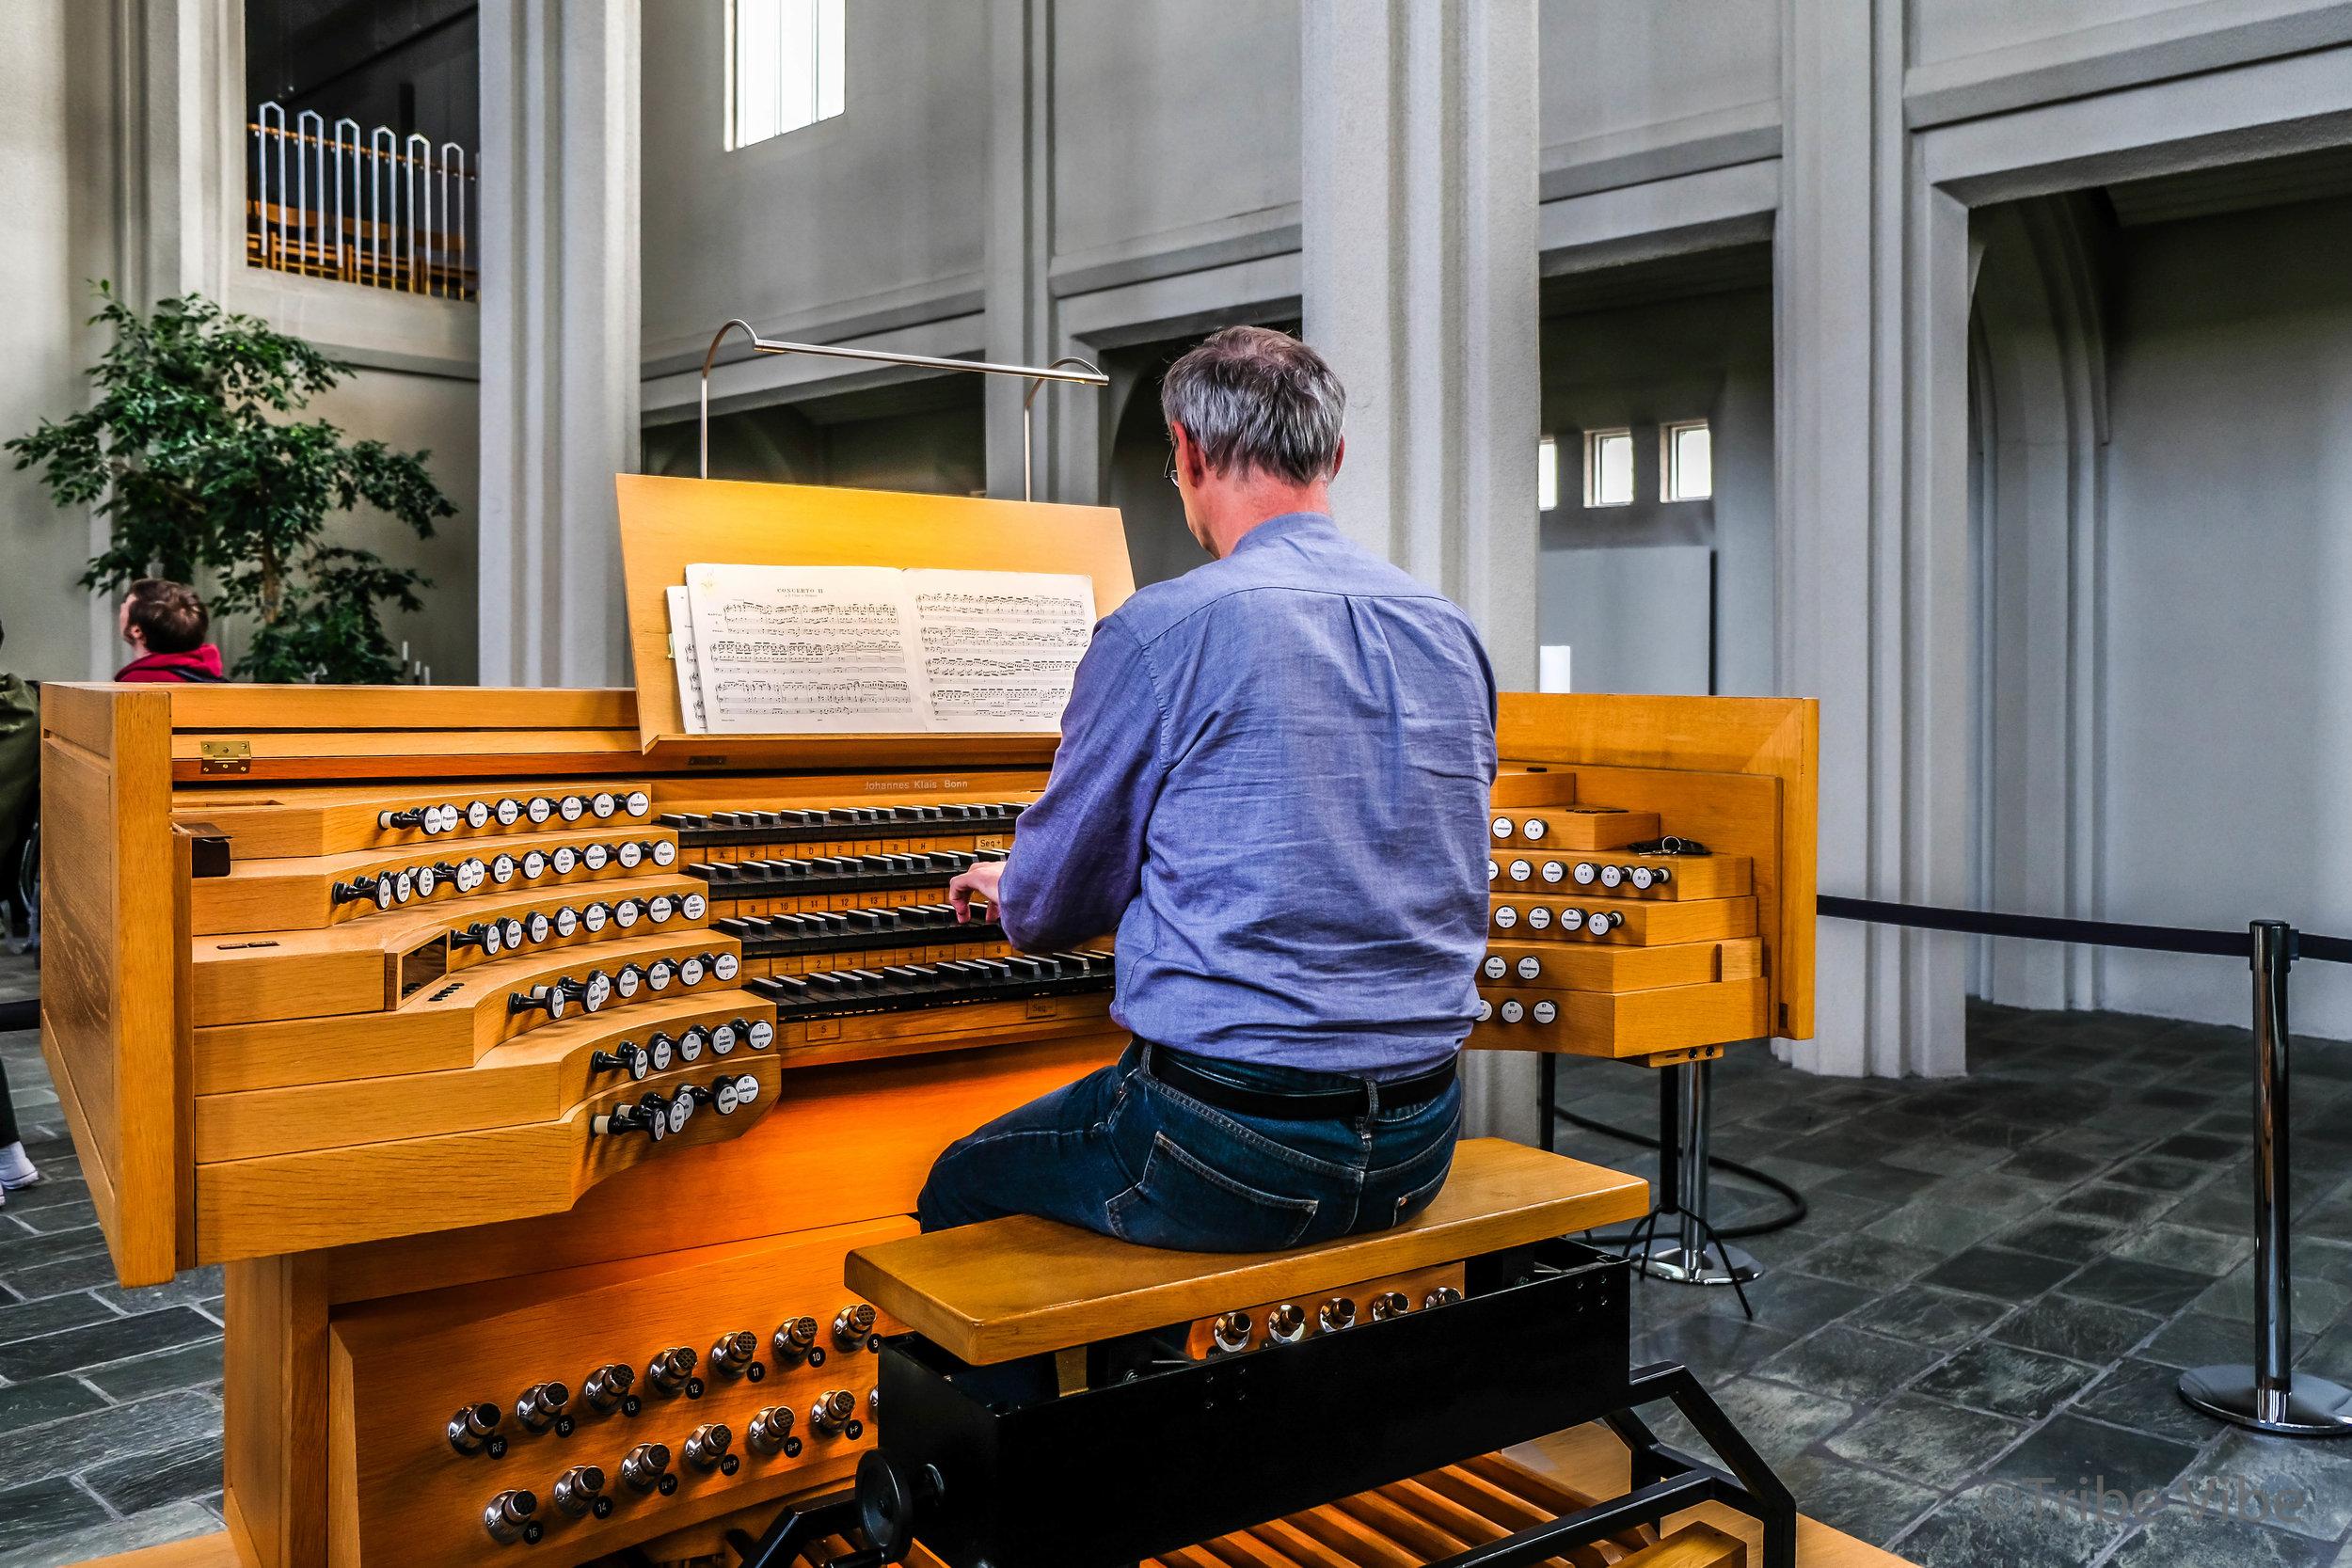 Organ in Hallgrimskirkja Church